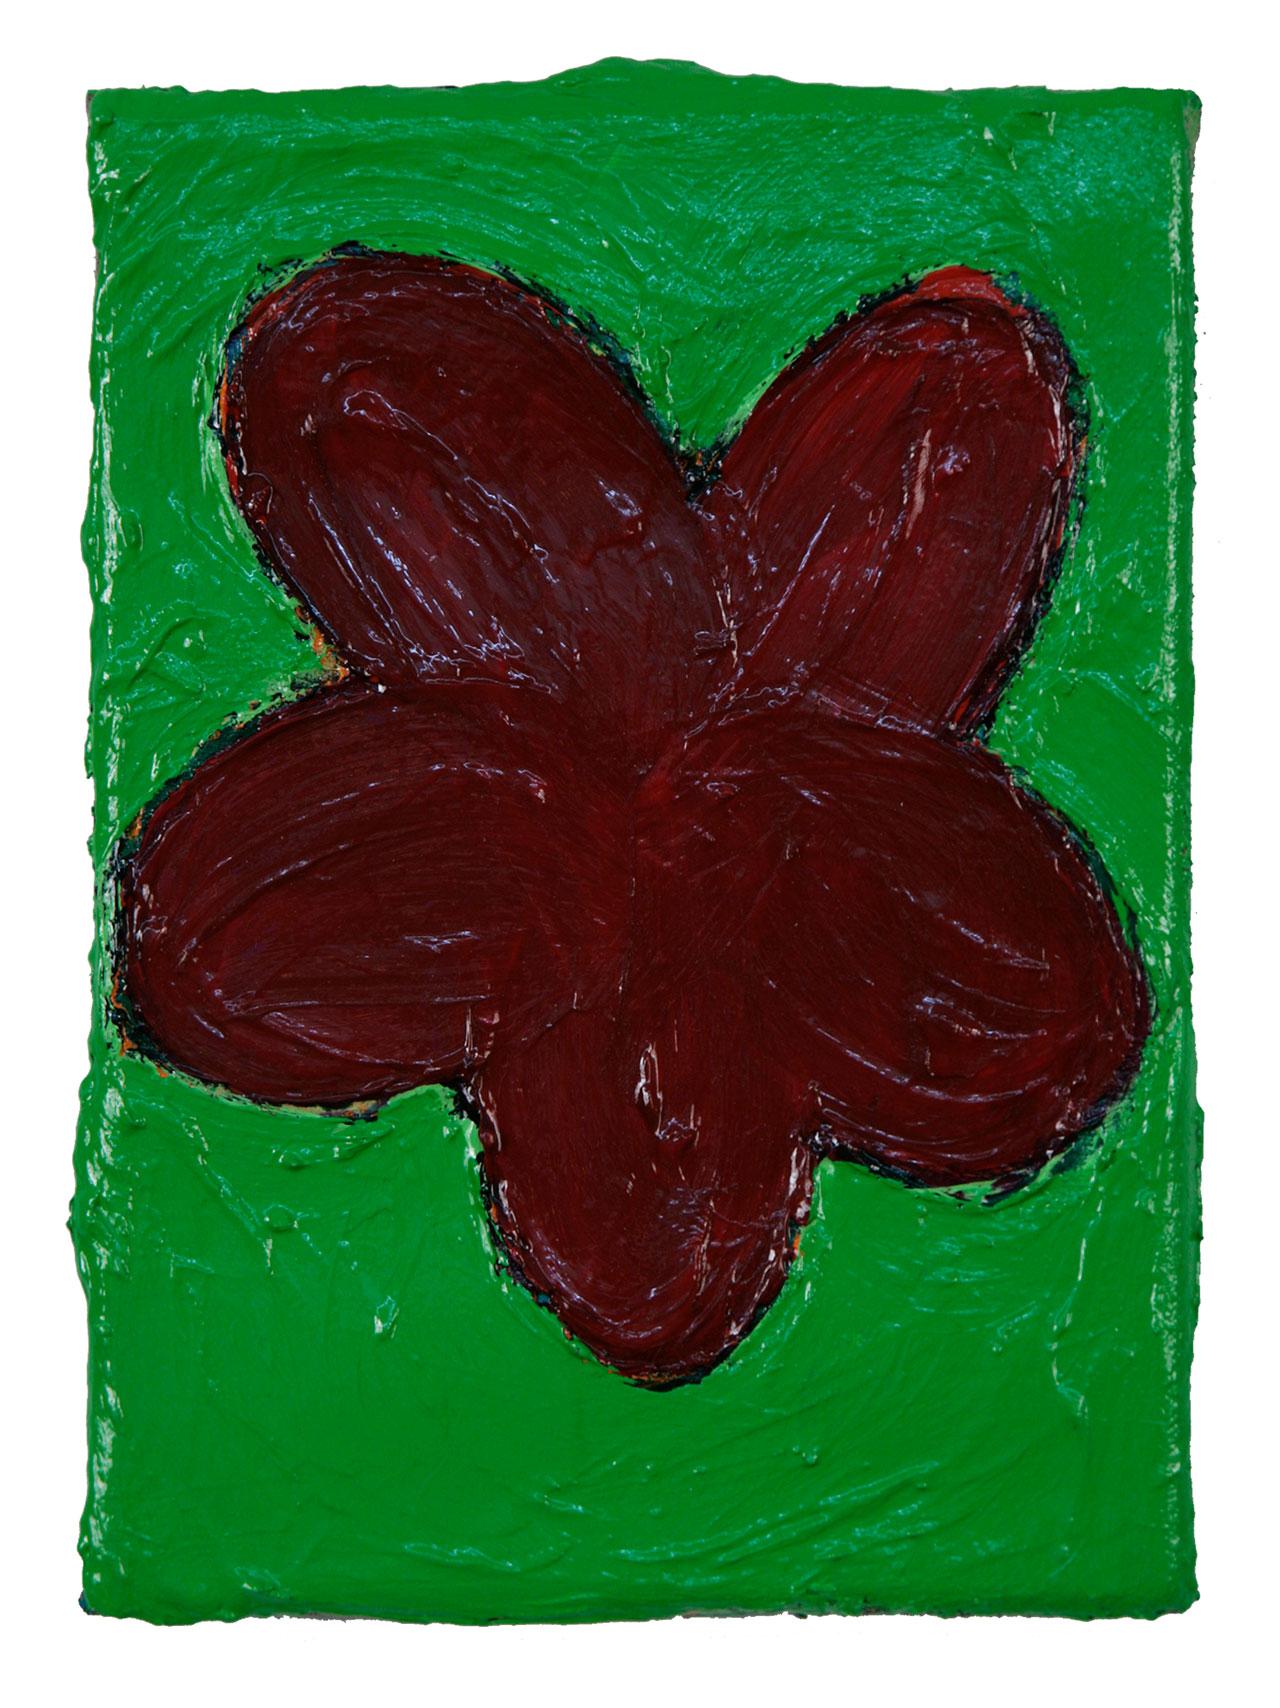 25 Flowers 10 | 2008 © Kerstin Jeckel | MEMORY-PROJEKT # extra